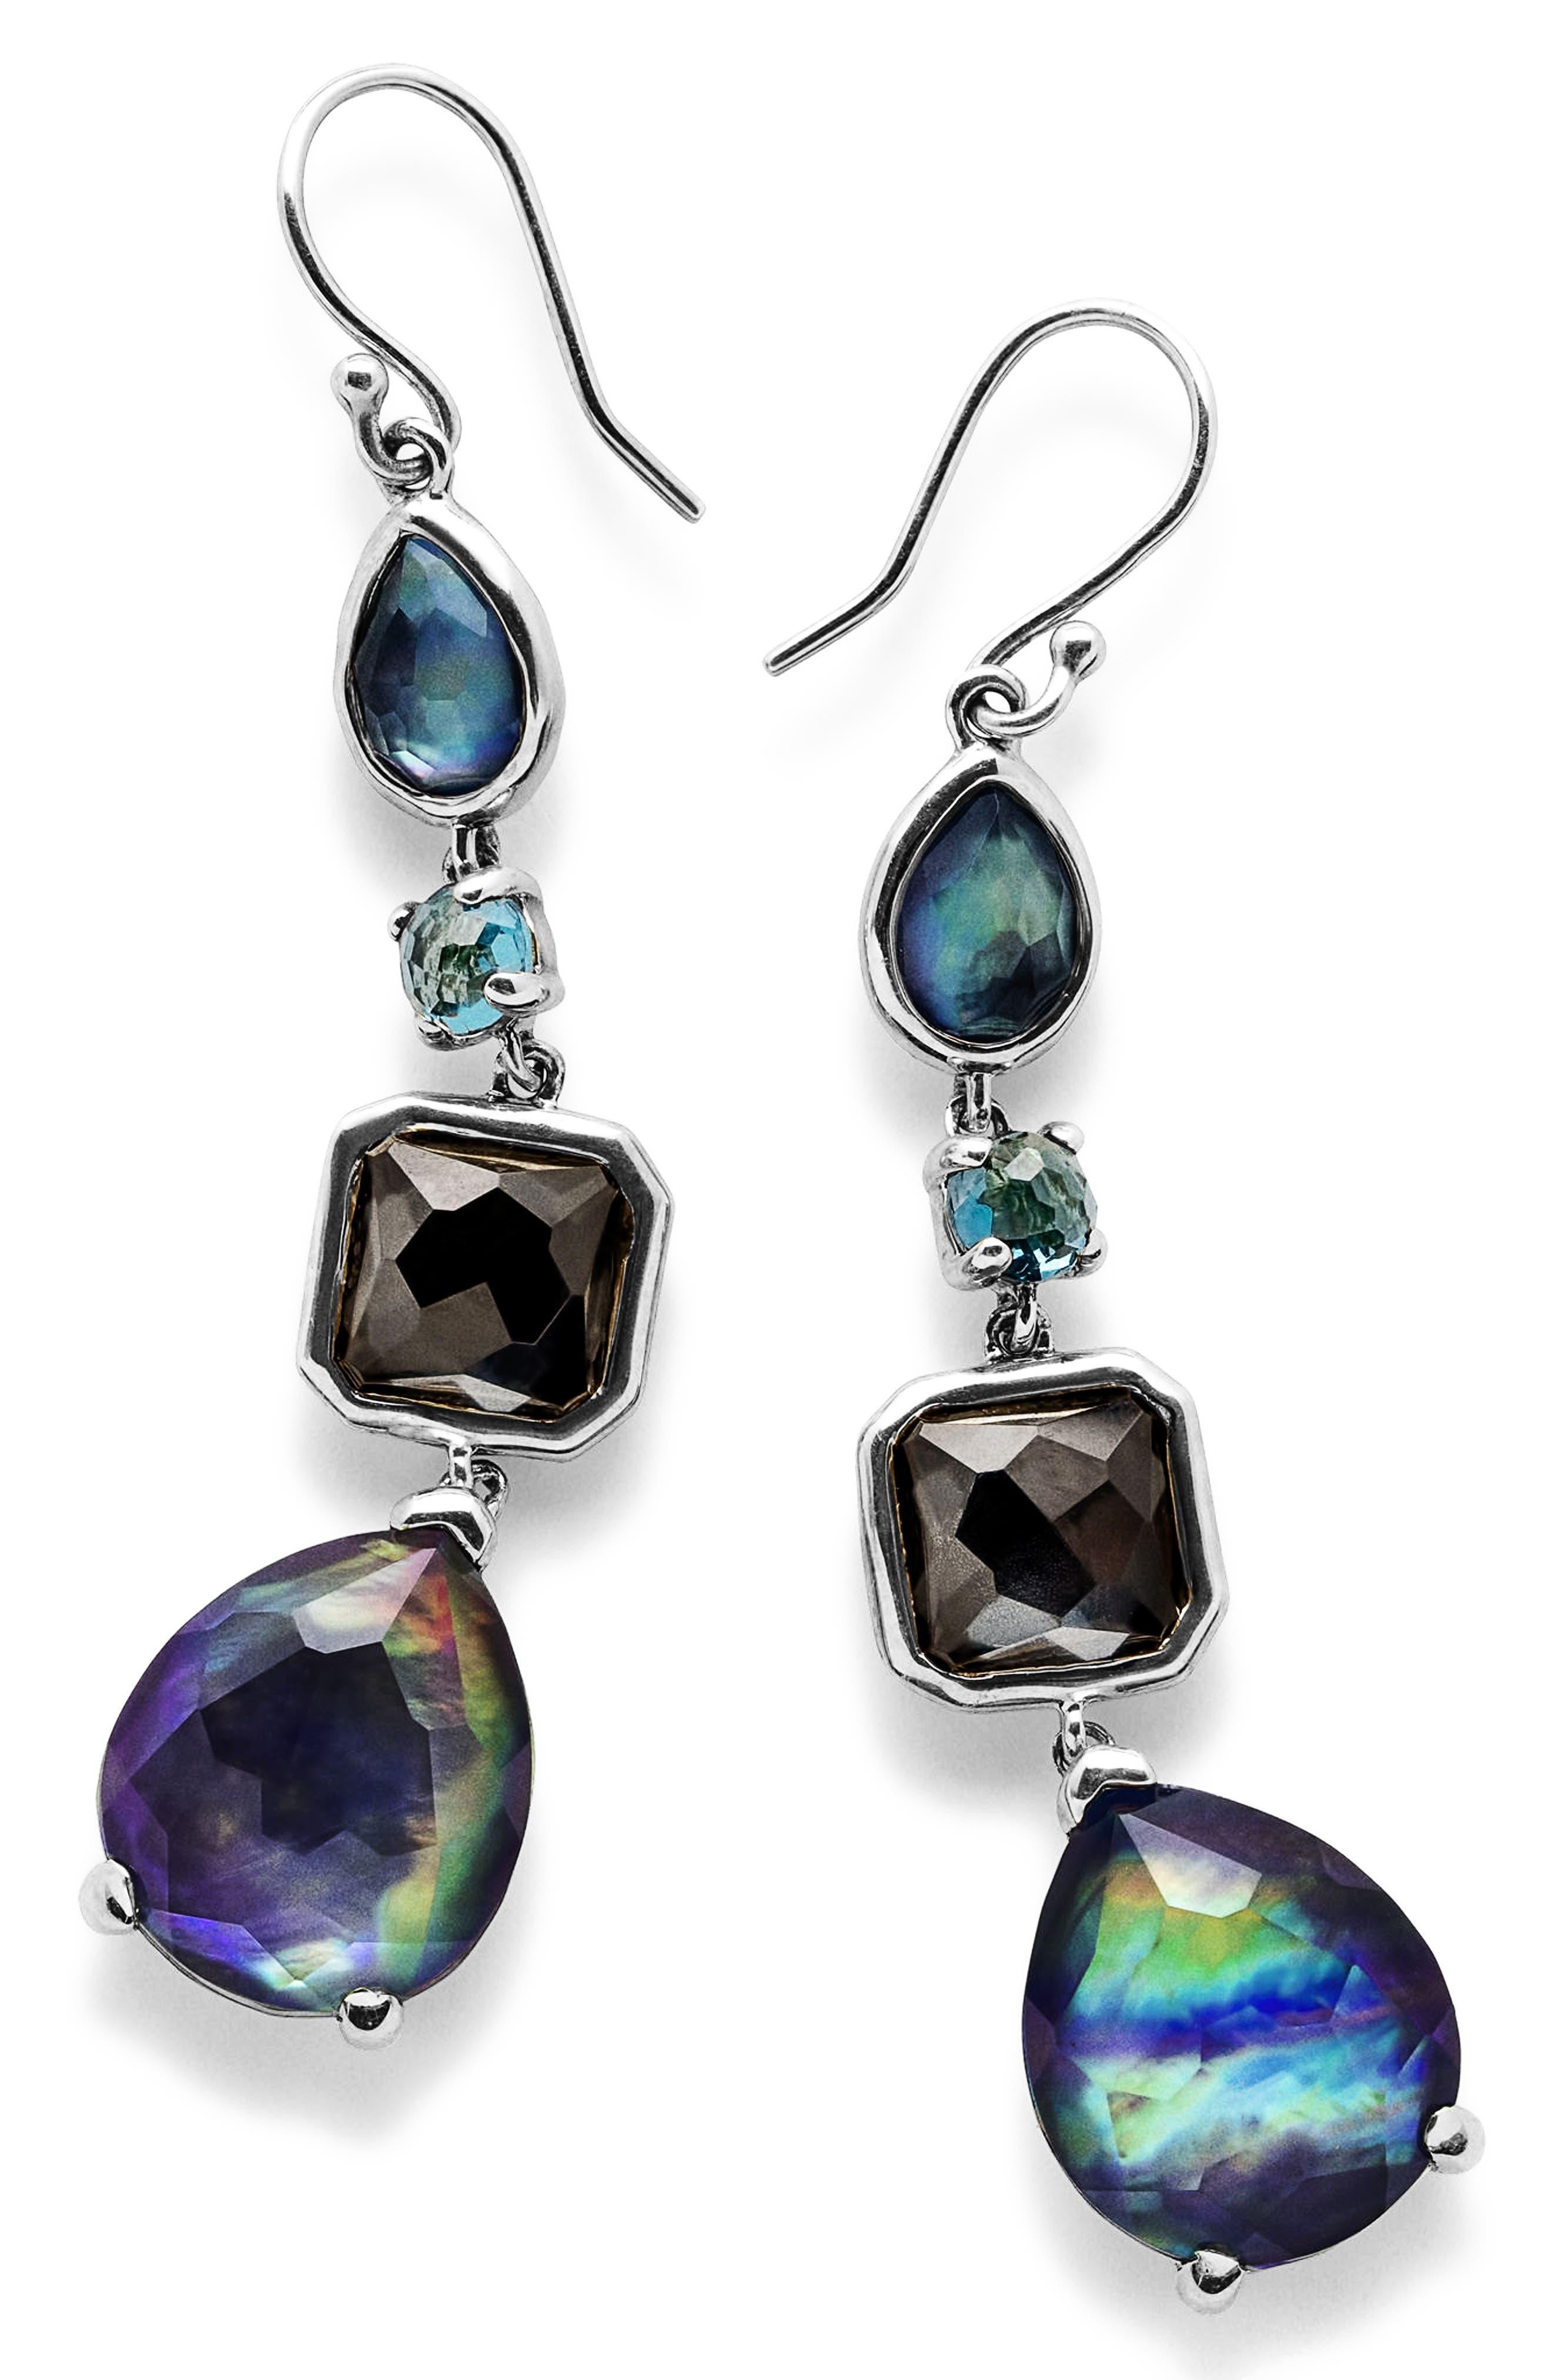 'Rock Candy' Linear Drop Earrings,                             Main thumbnail 1, color,                             400